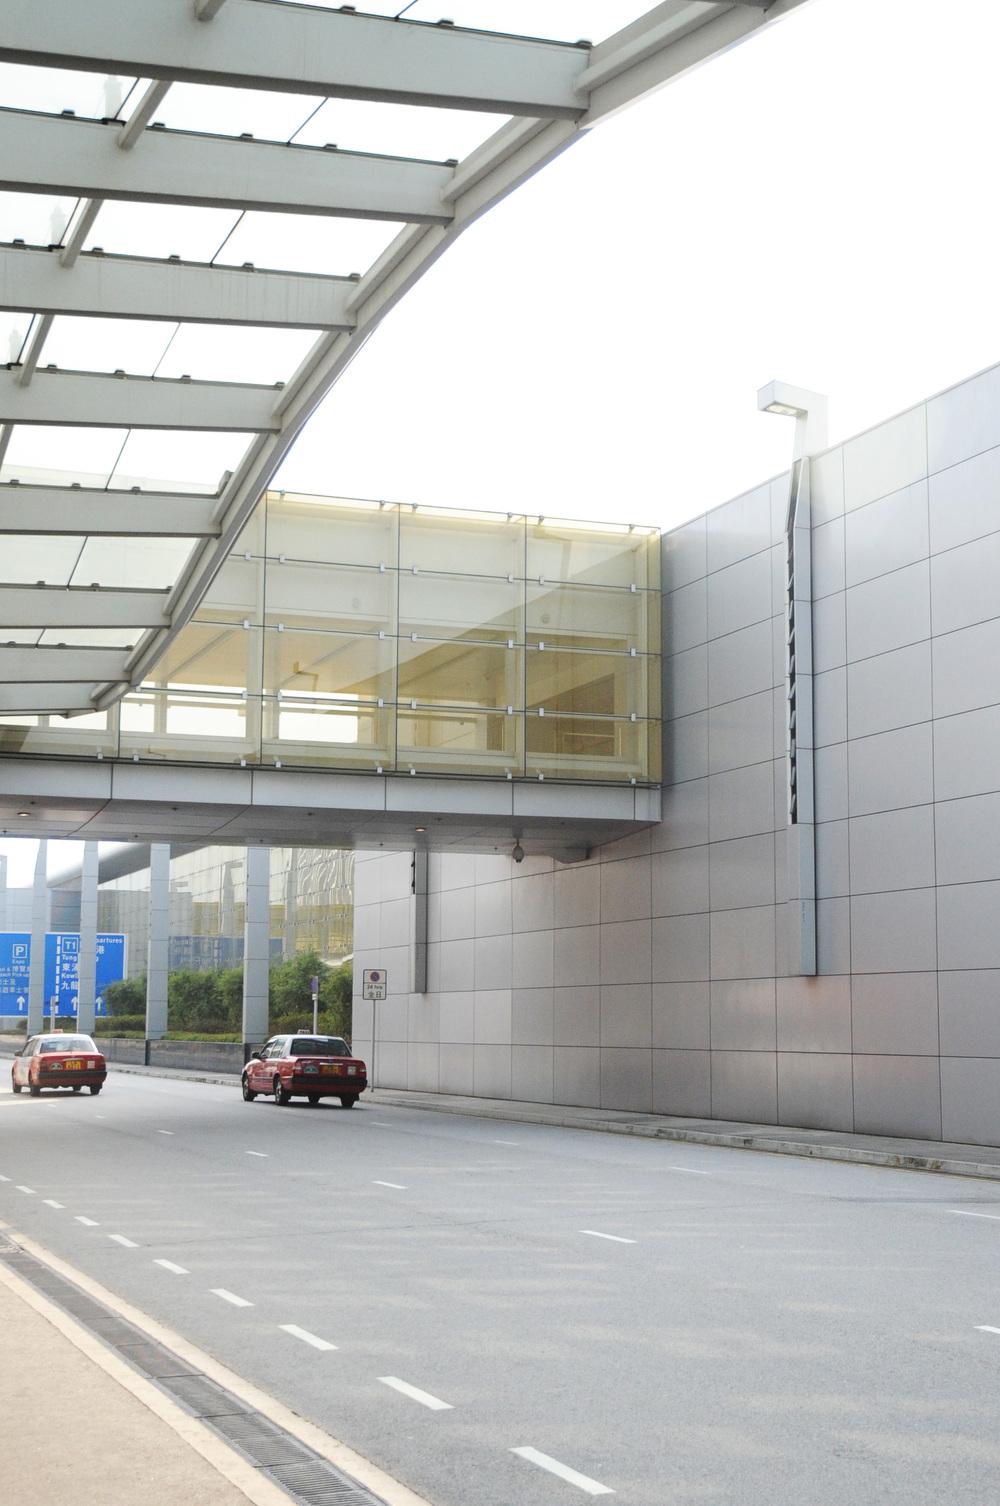 Hong Kong Airport Terminal 2 Sky Plaza_17.jpg